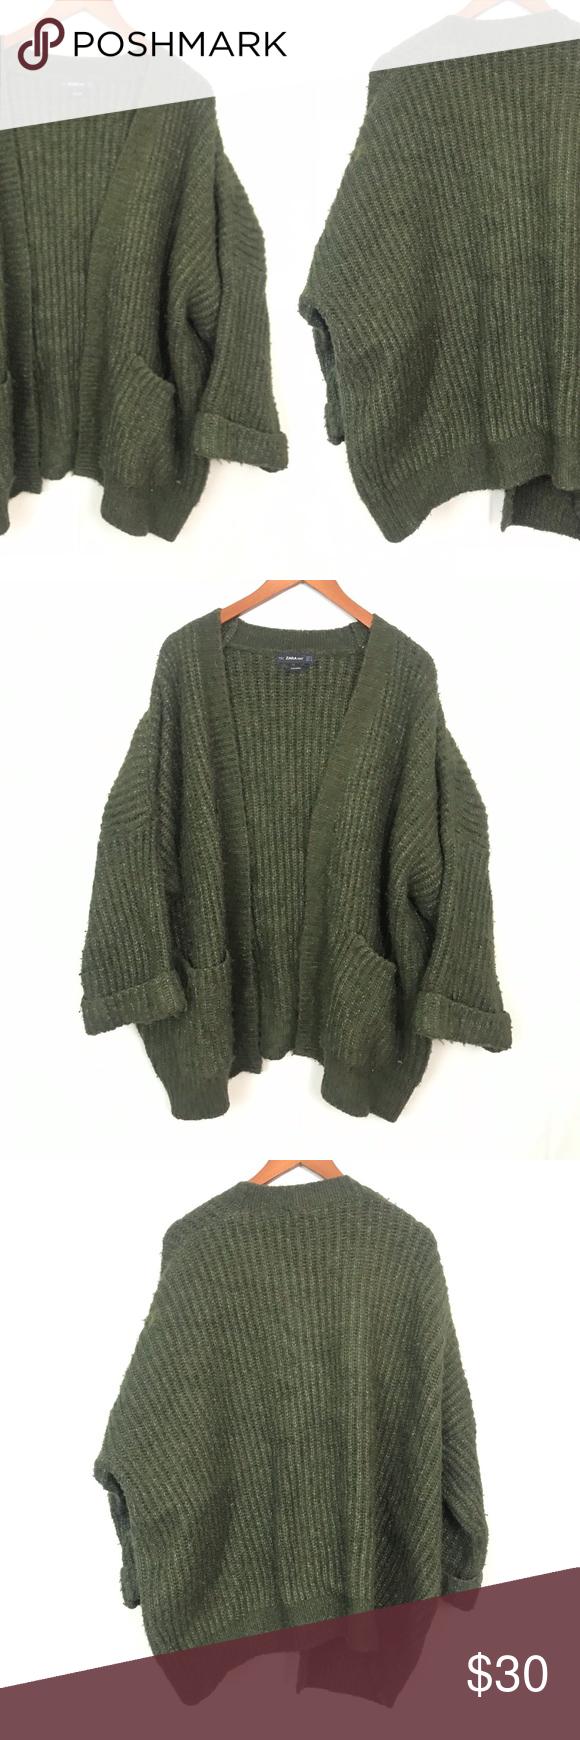 Zara Knit | Oversized Wool Blend Knit Cardigan S | Knit